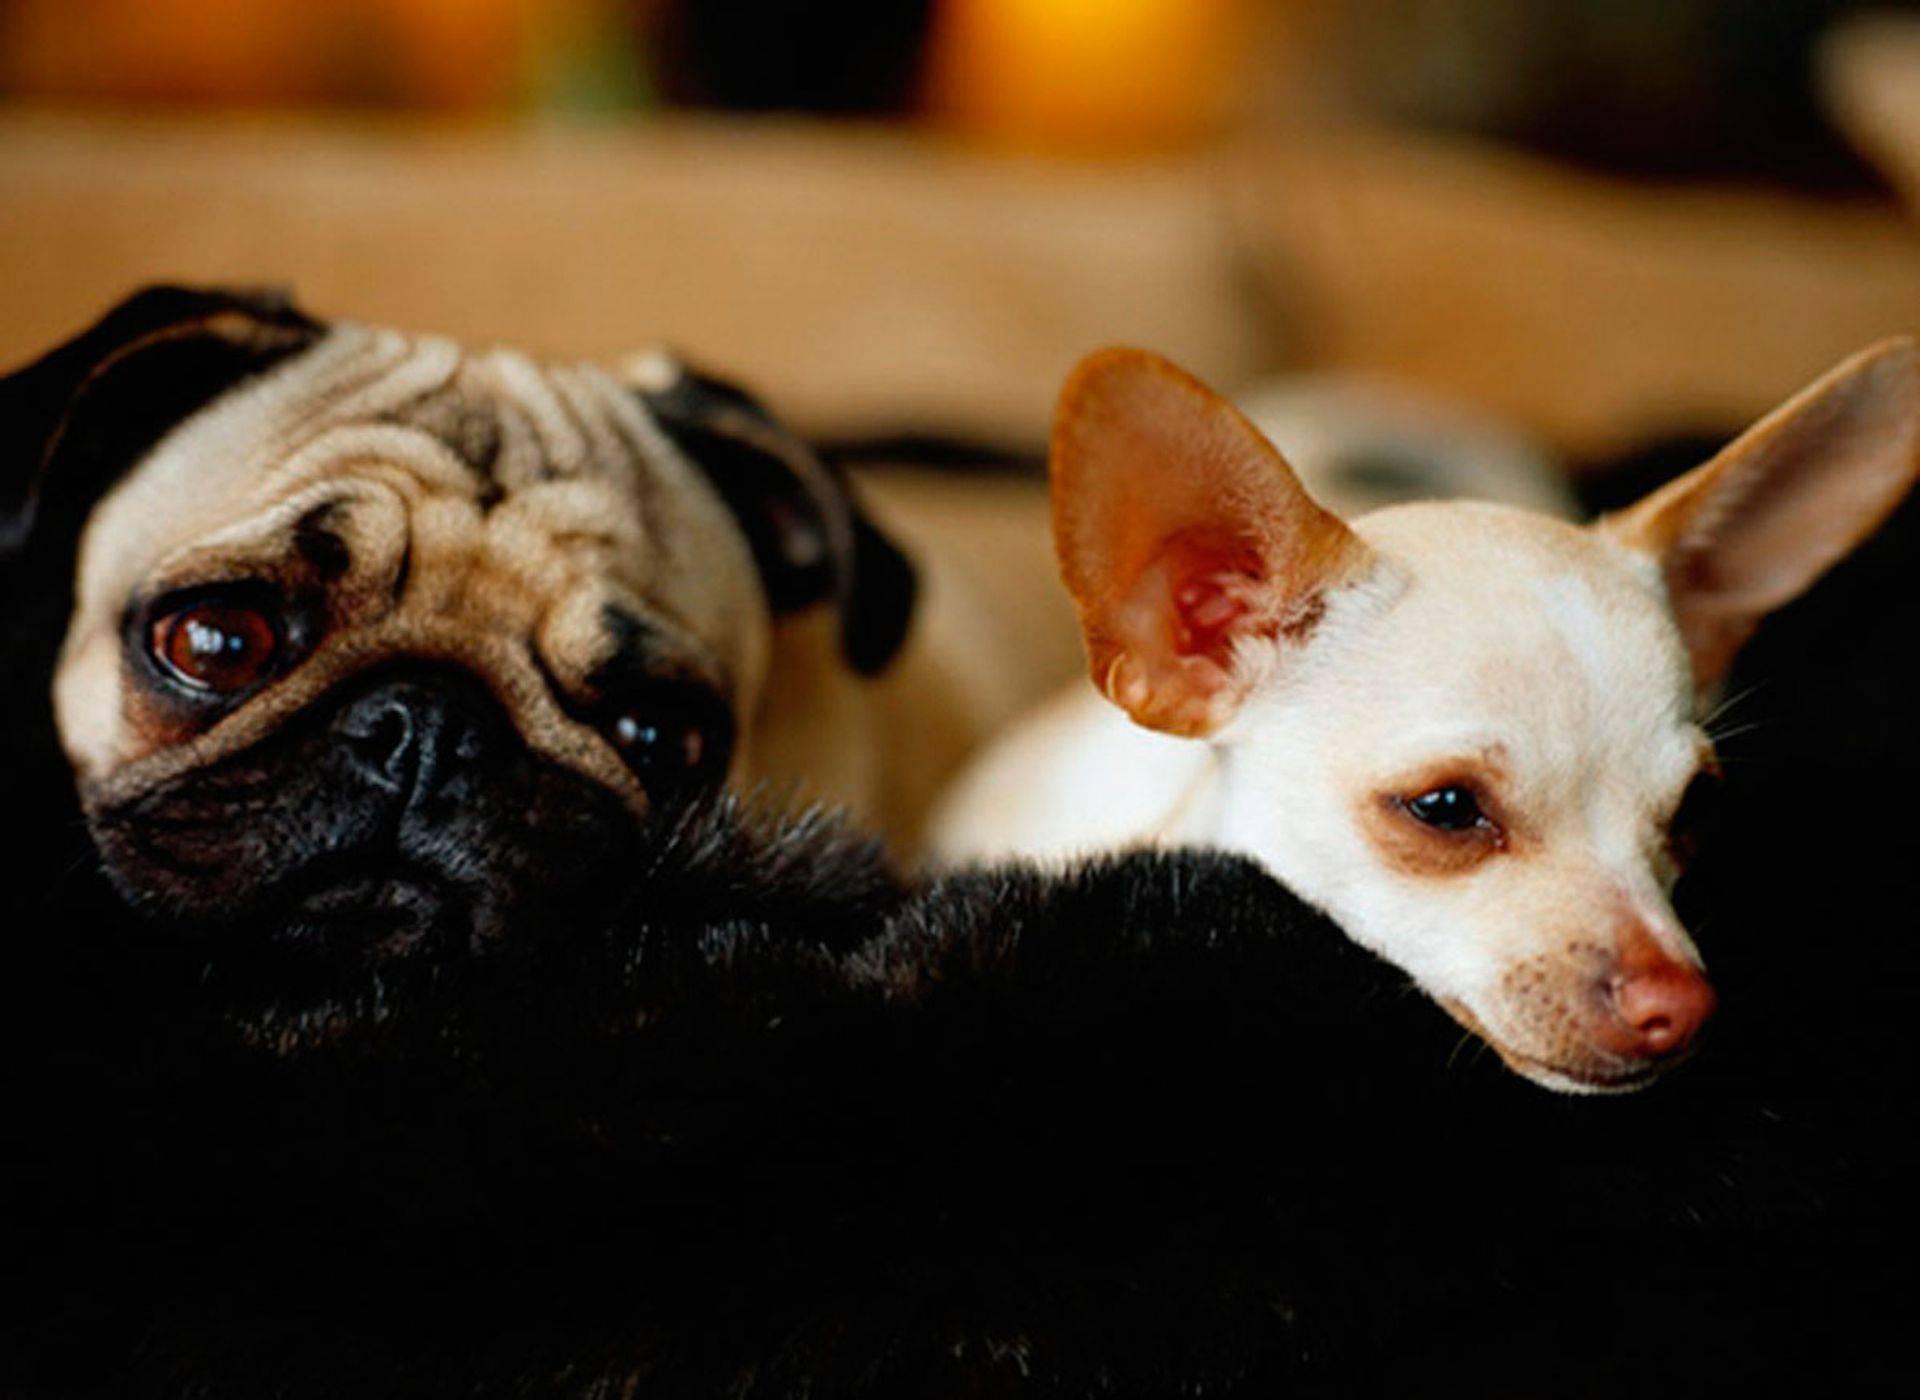 Dog Sitter Pet Services, Pets Sitting , Dog Walking, House Sitting, Pet Sitter , dog walker , Pet Taxi, dog bathing, brushing, Spring Texas, The Woodlands , Houston Texas, Cypress Texas